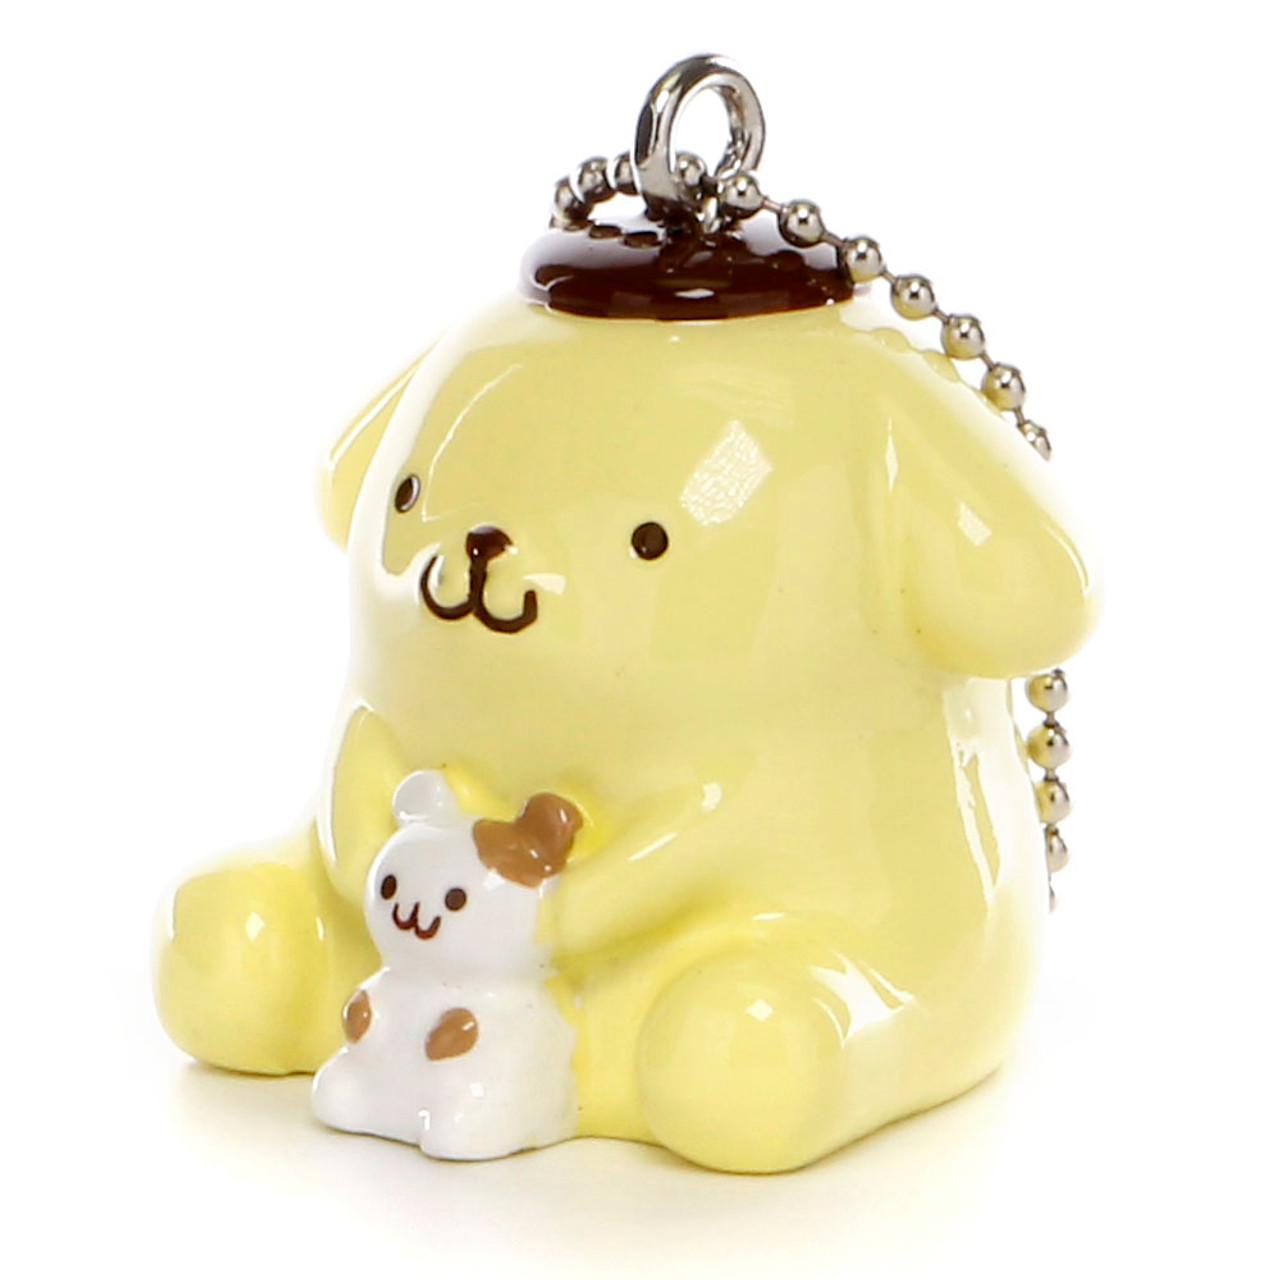 Pom Pom Purin Vinyl Mascot Charms - Hamster ( Side View )